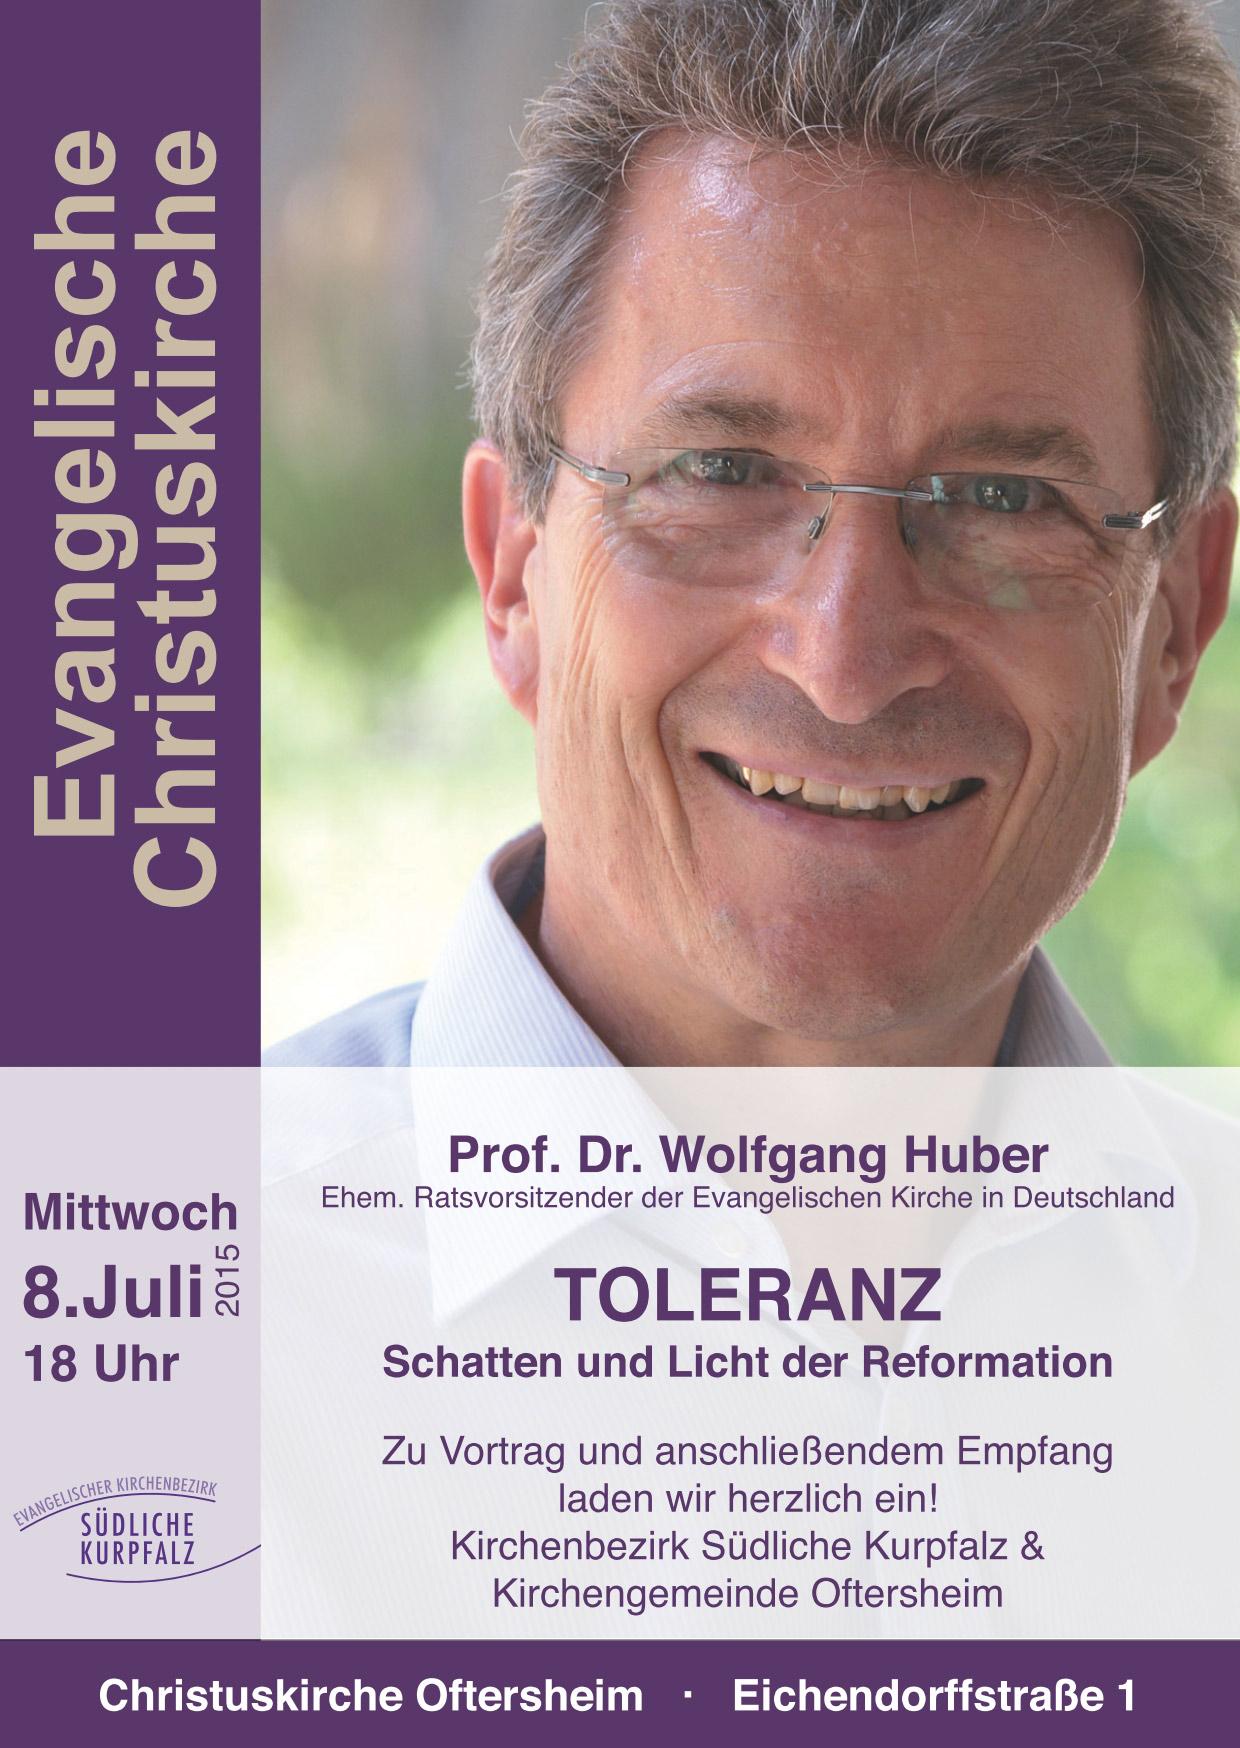 KG6-Vortrag-Huber-Gemeindebrief